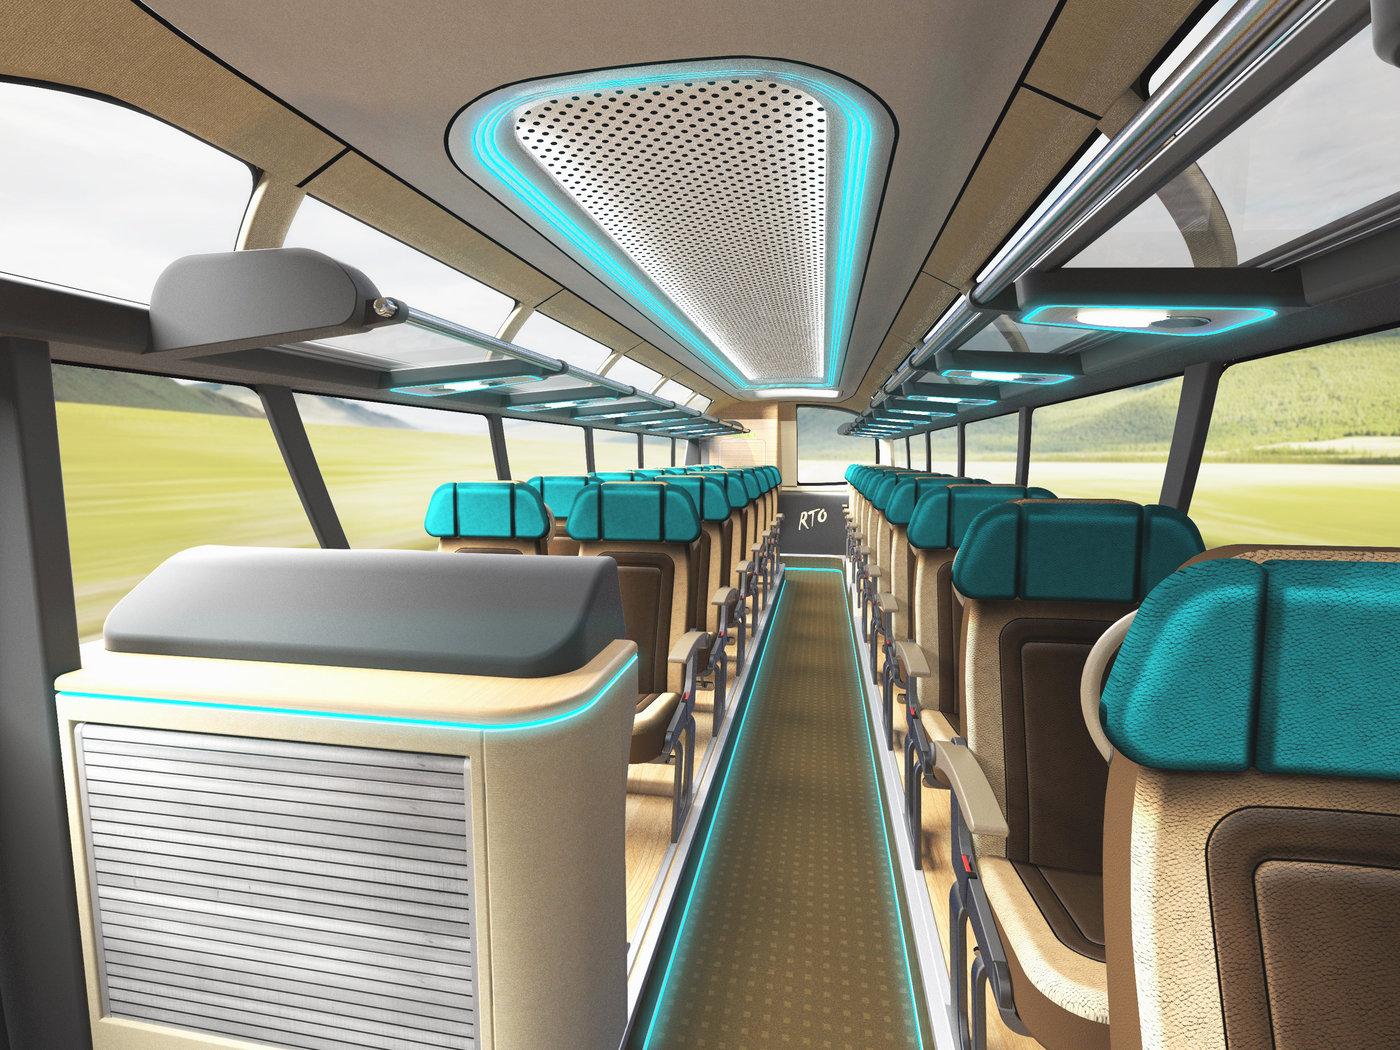 Bus Design By Miroslav Dorotcin At Coroflot Com